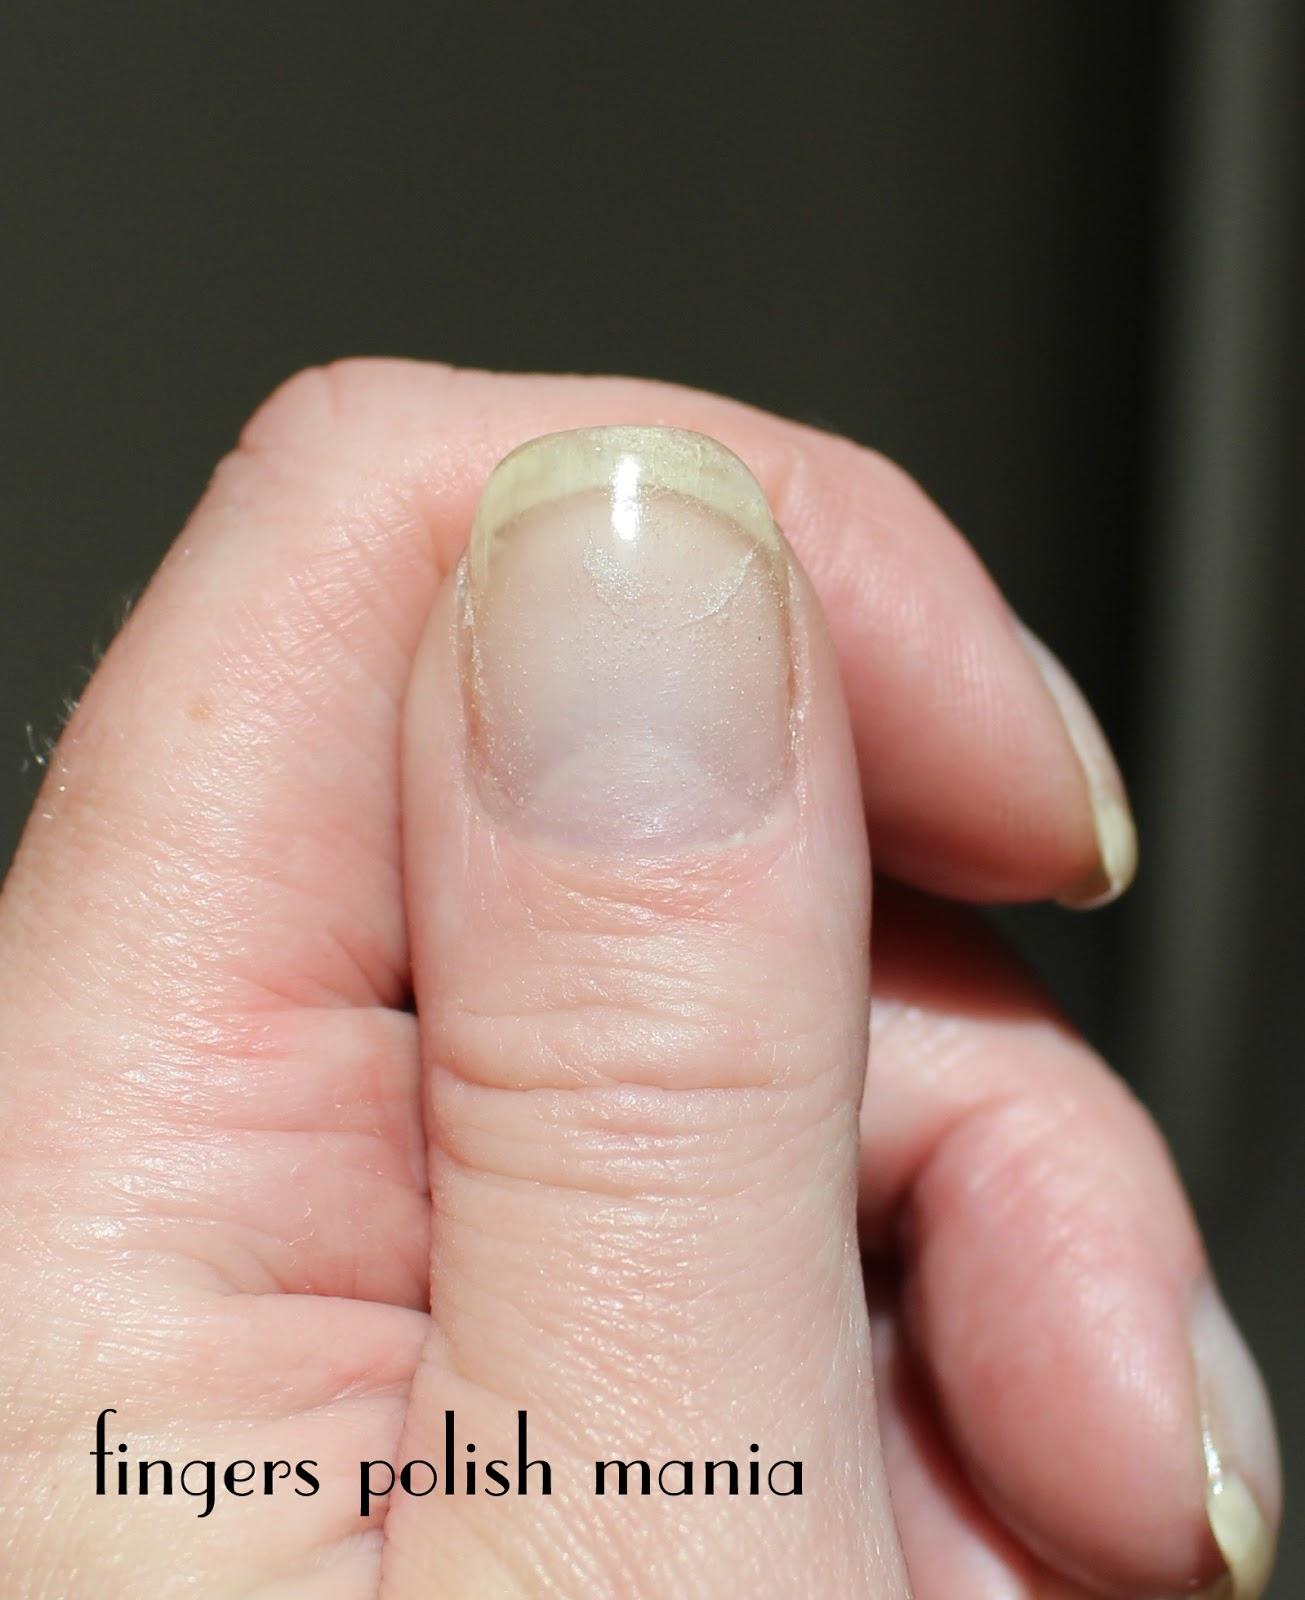 fingers polish mania: EZ Dip Gel Nails Clear Version